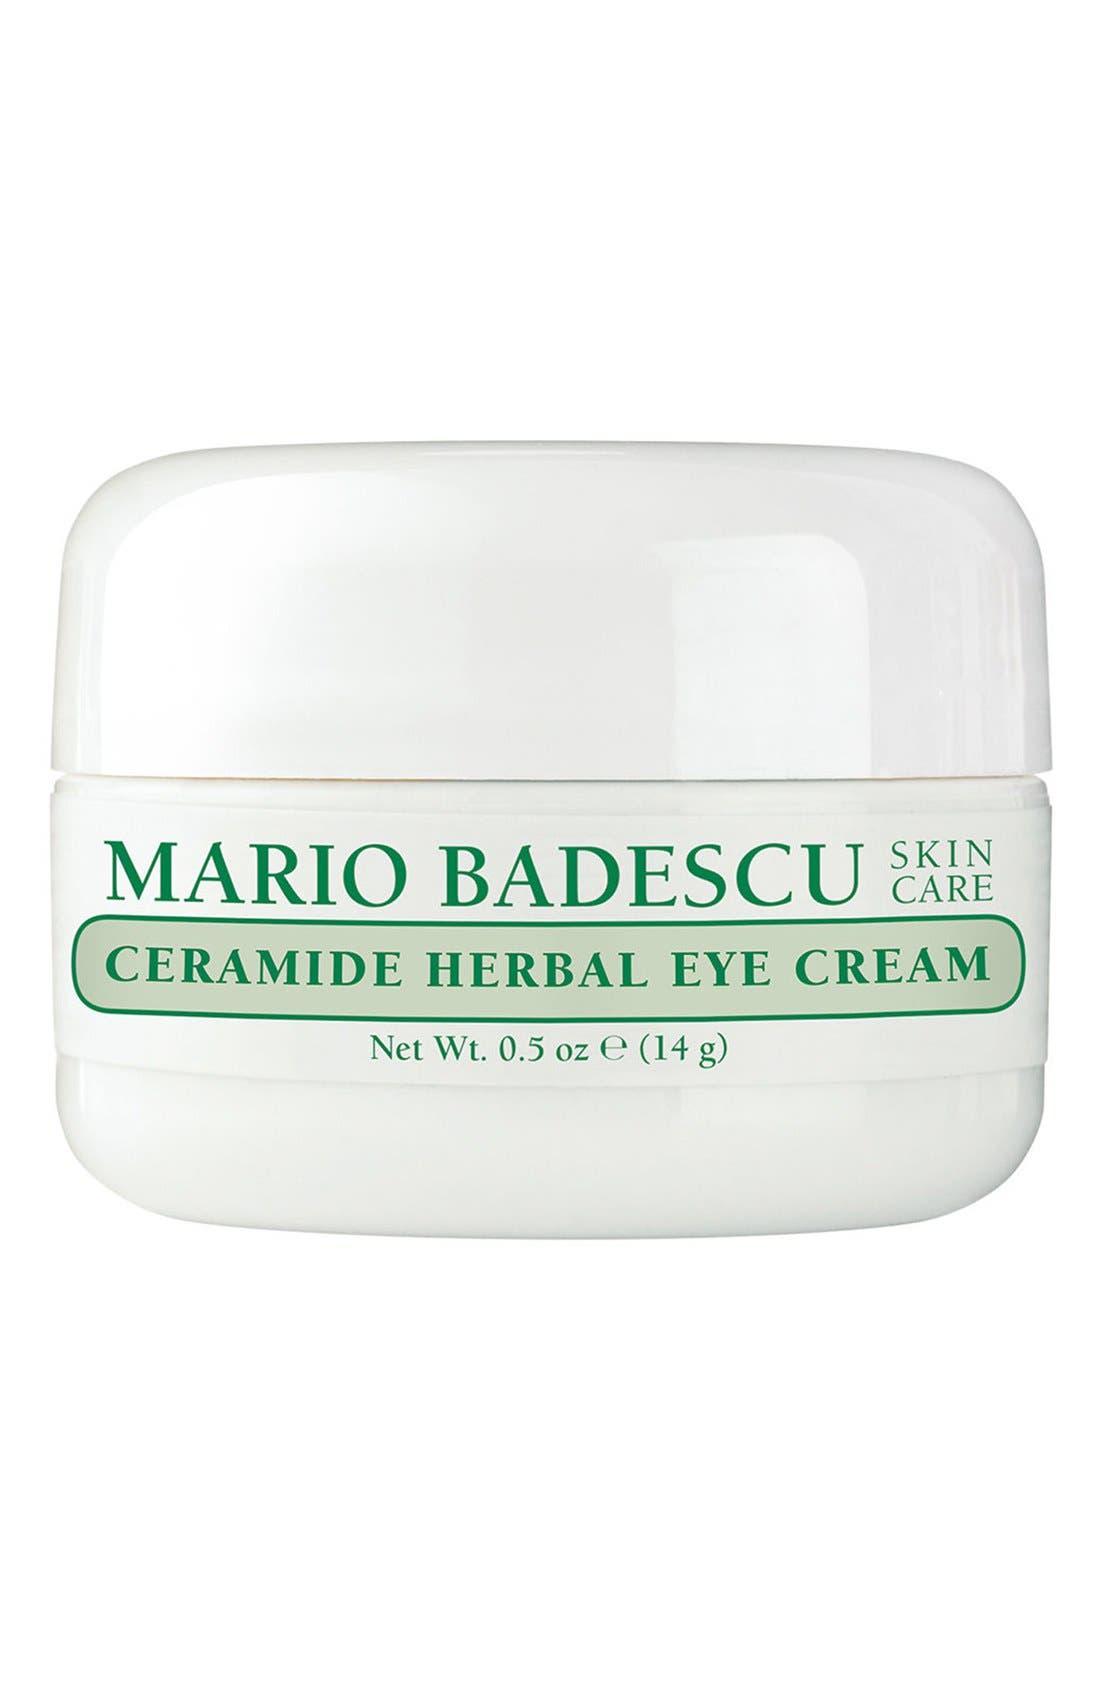 Mario Badescu Ceramide Herbal Eye Cream